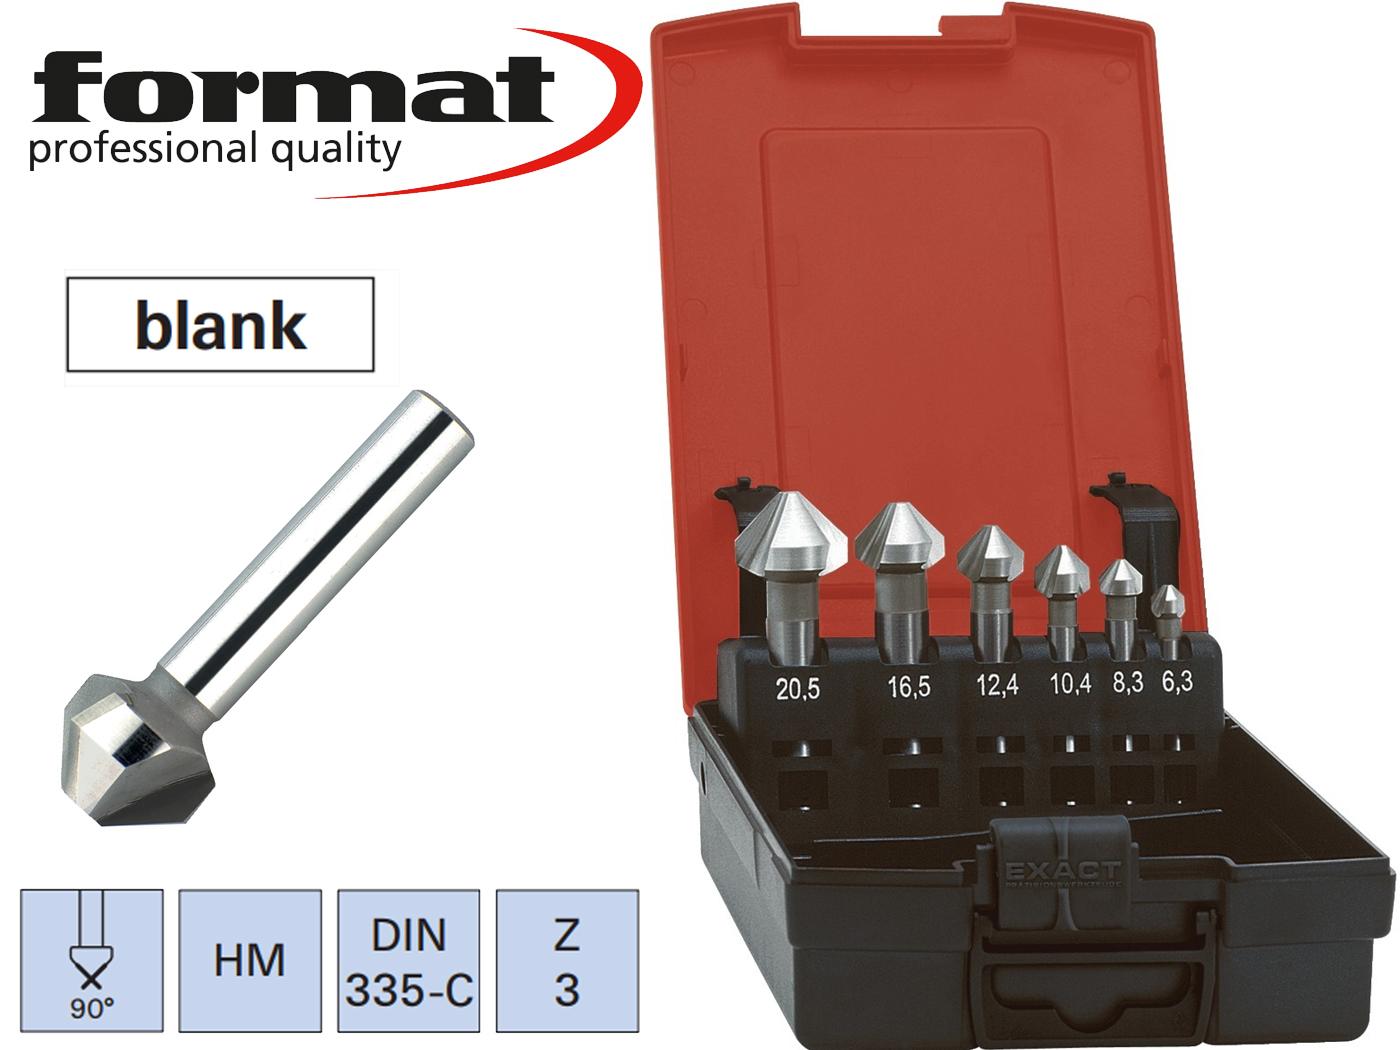 verzinkboor set DIN 335C VHM 90G FORMAT | DKMTools - DKM Tools